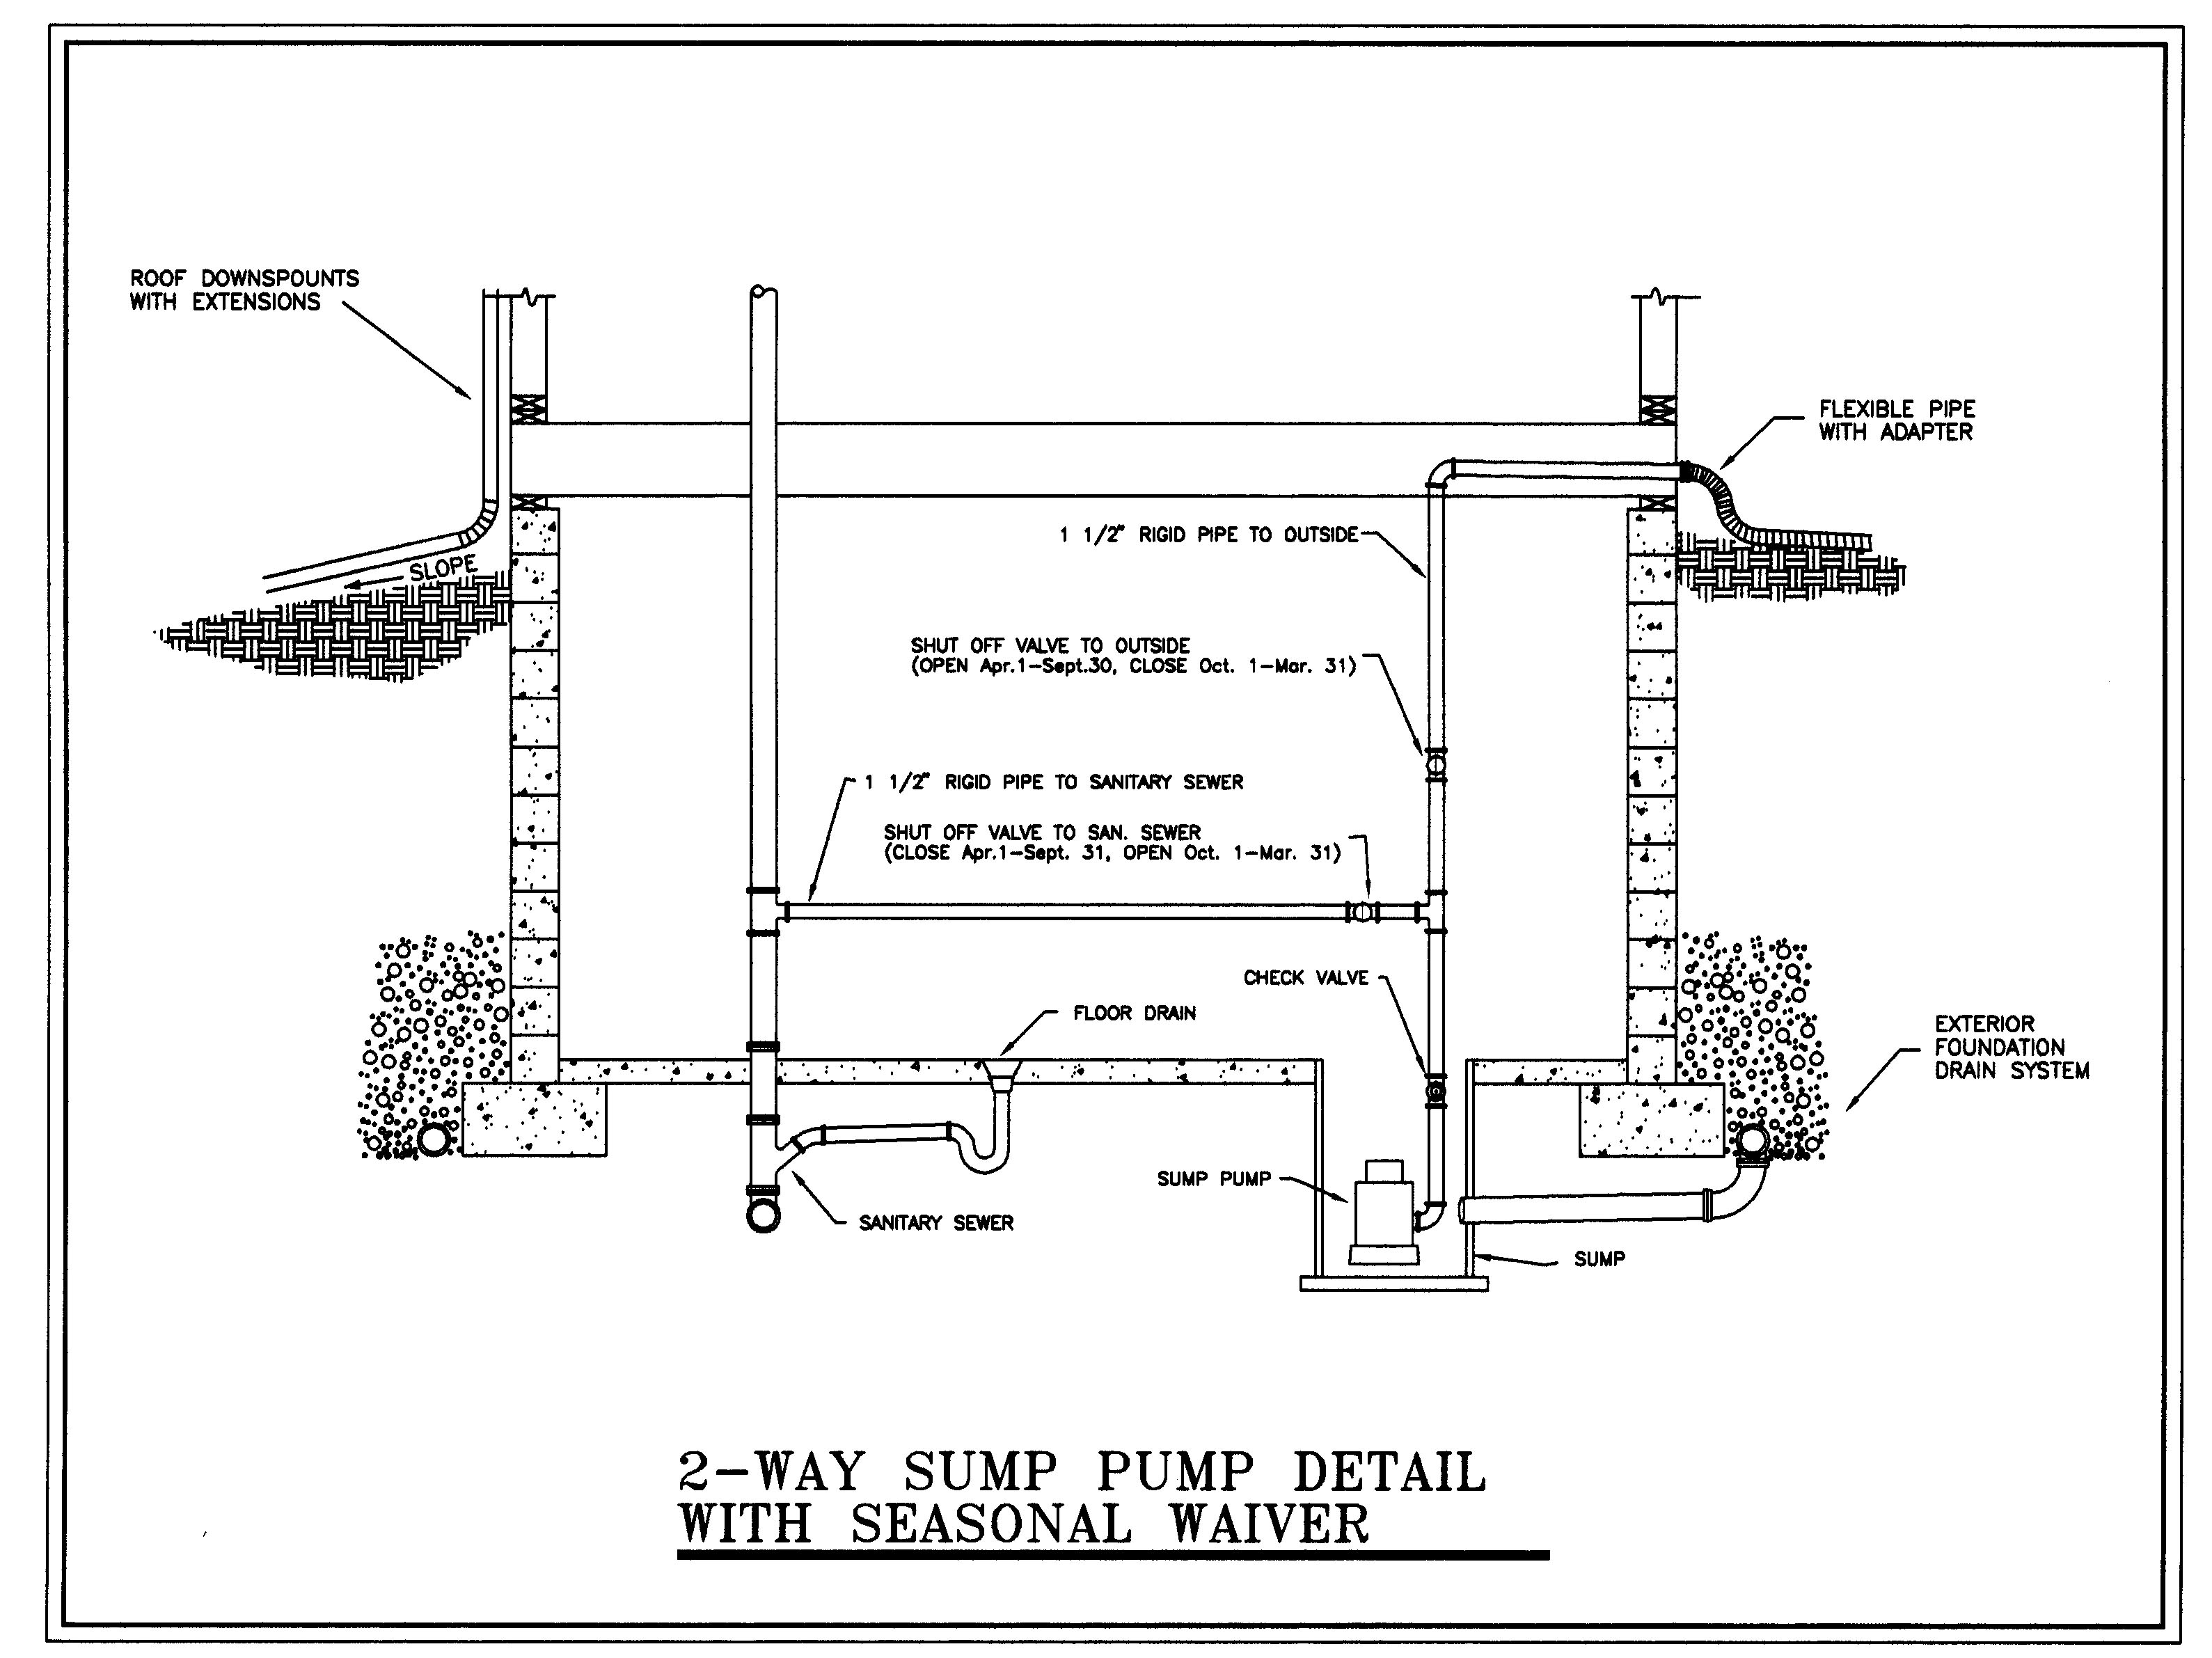 Pump foundation drawing